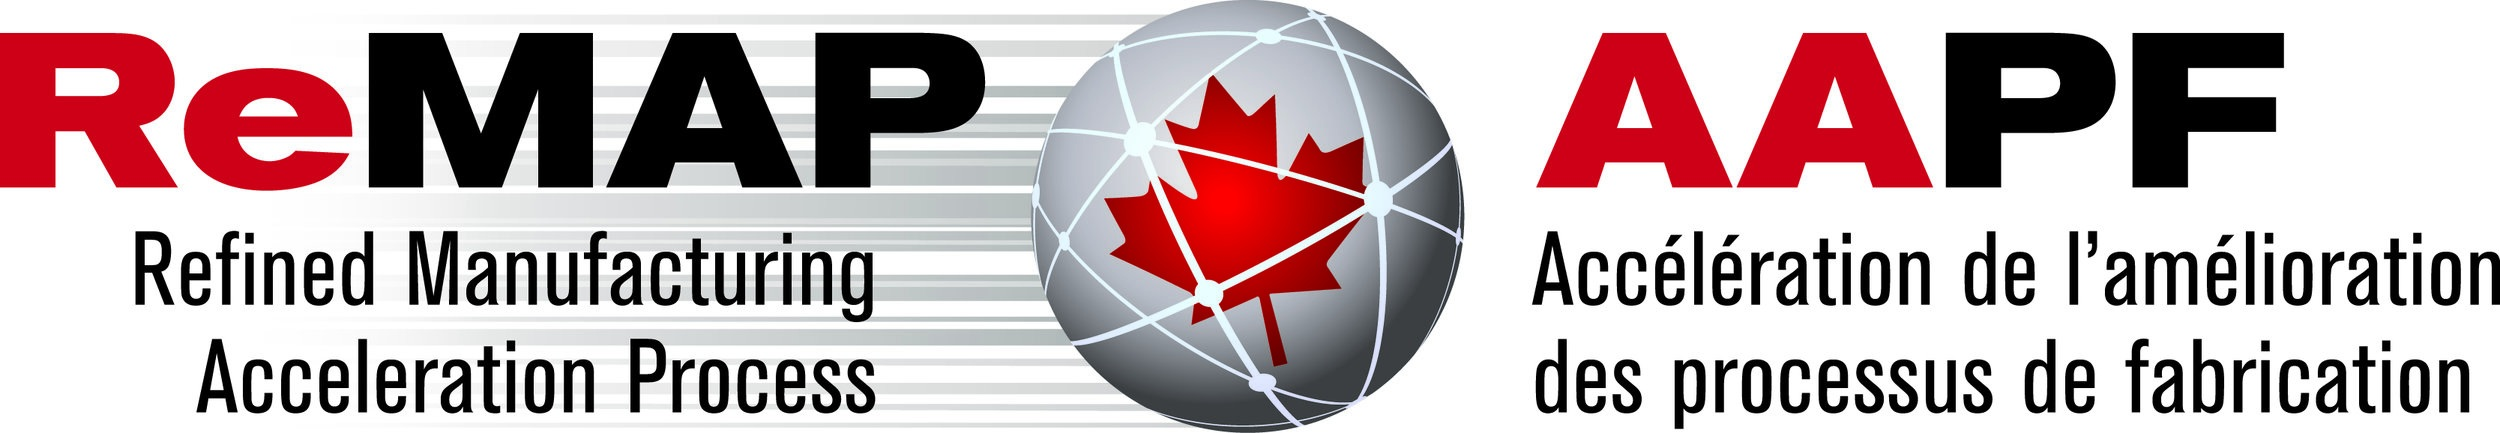 remap_logo_bilingual_cmyk_012714.jpg